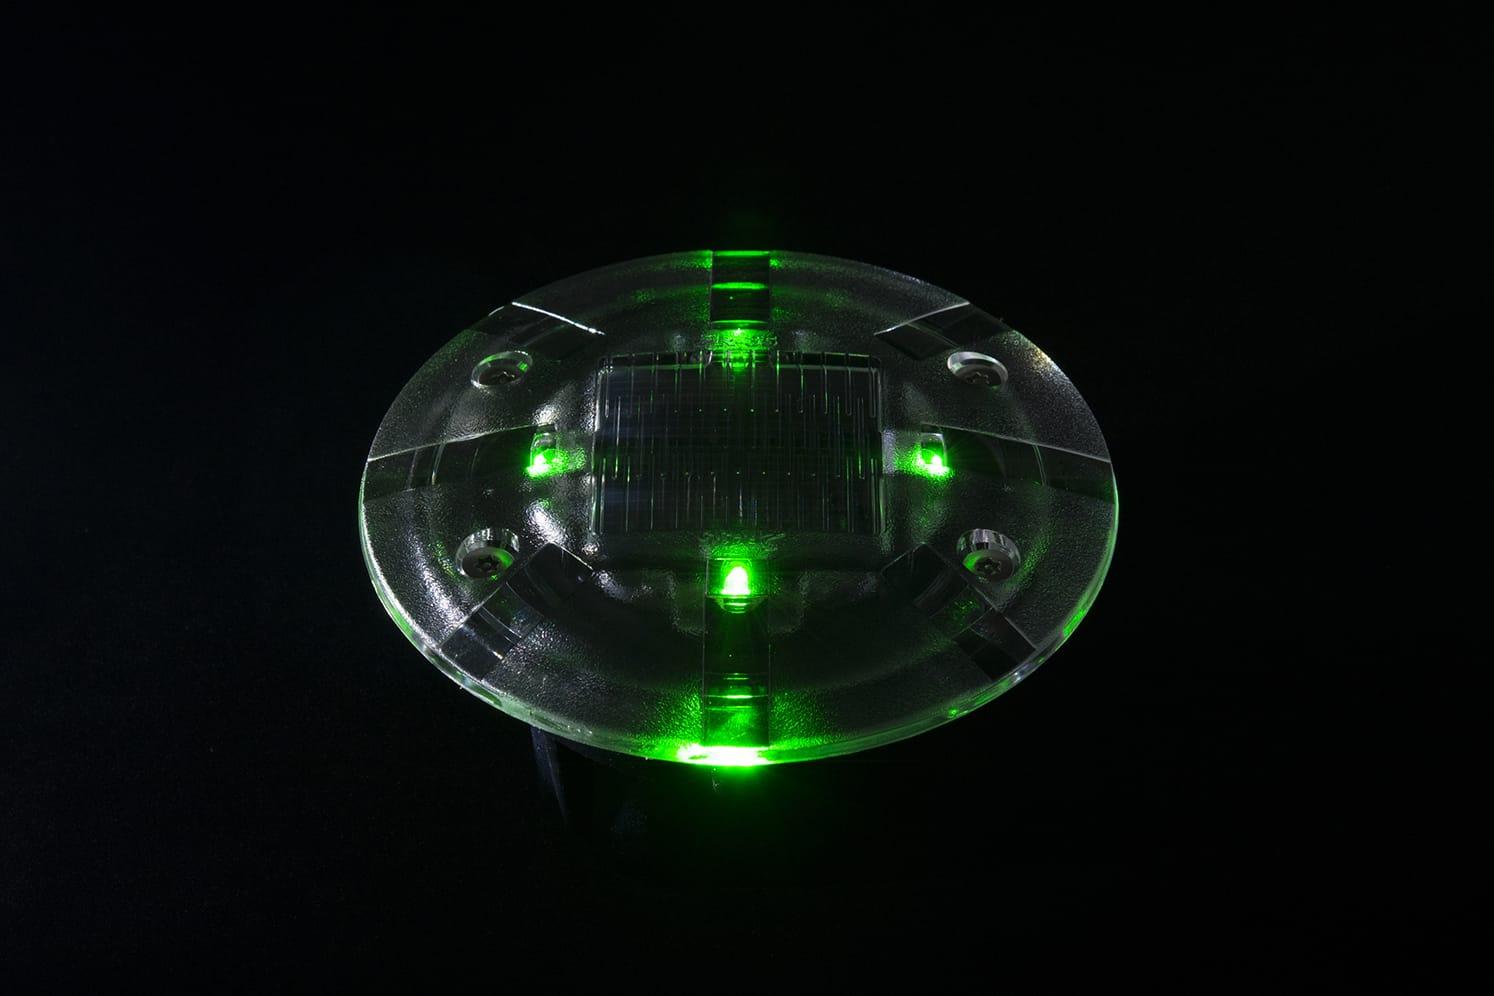 Plot LED solaire pietons velos ECO-35 vert